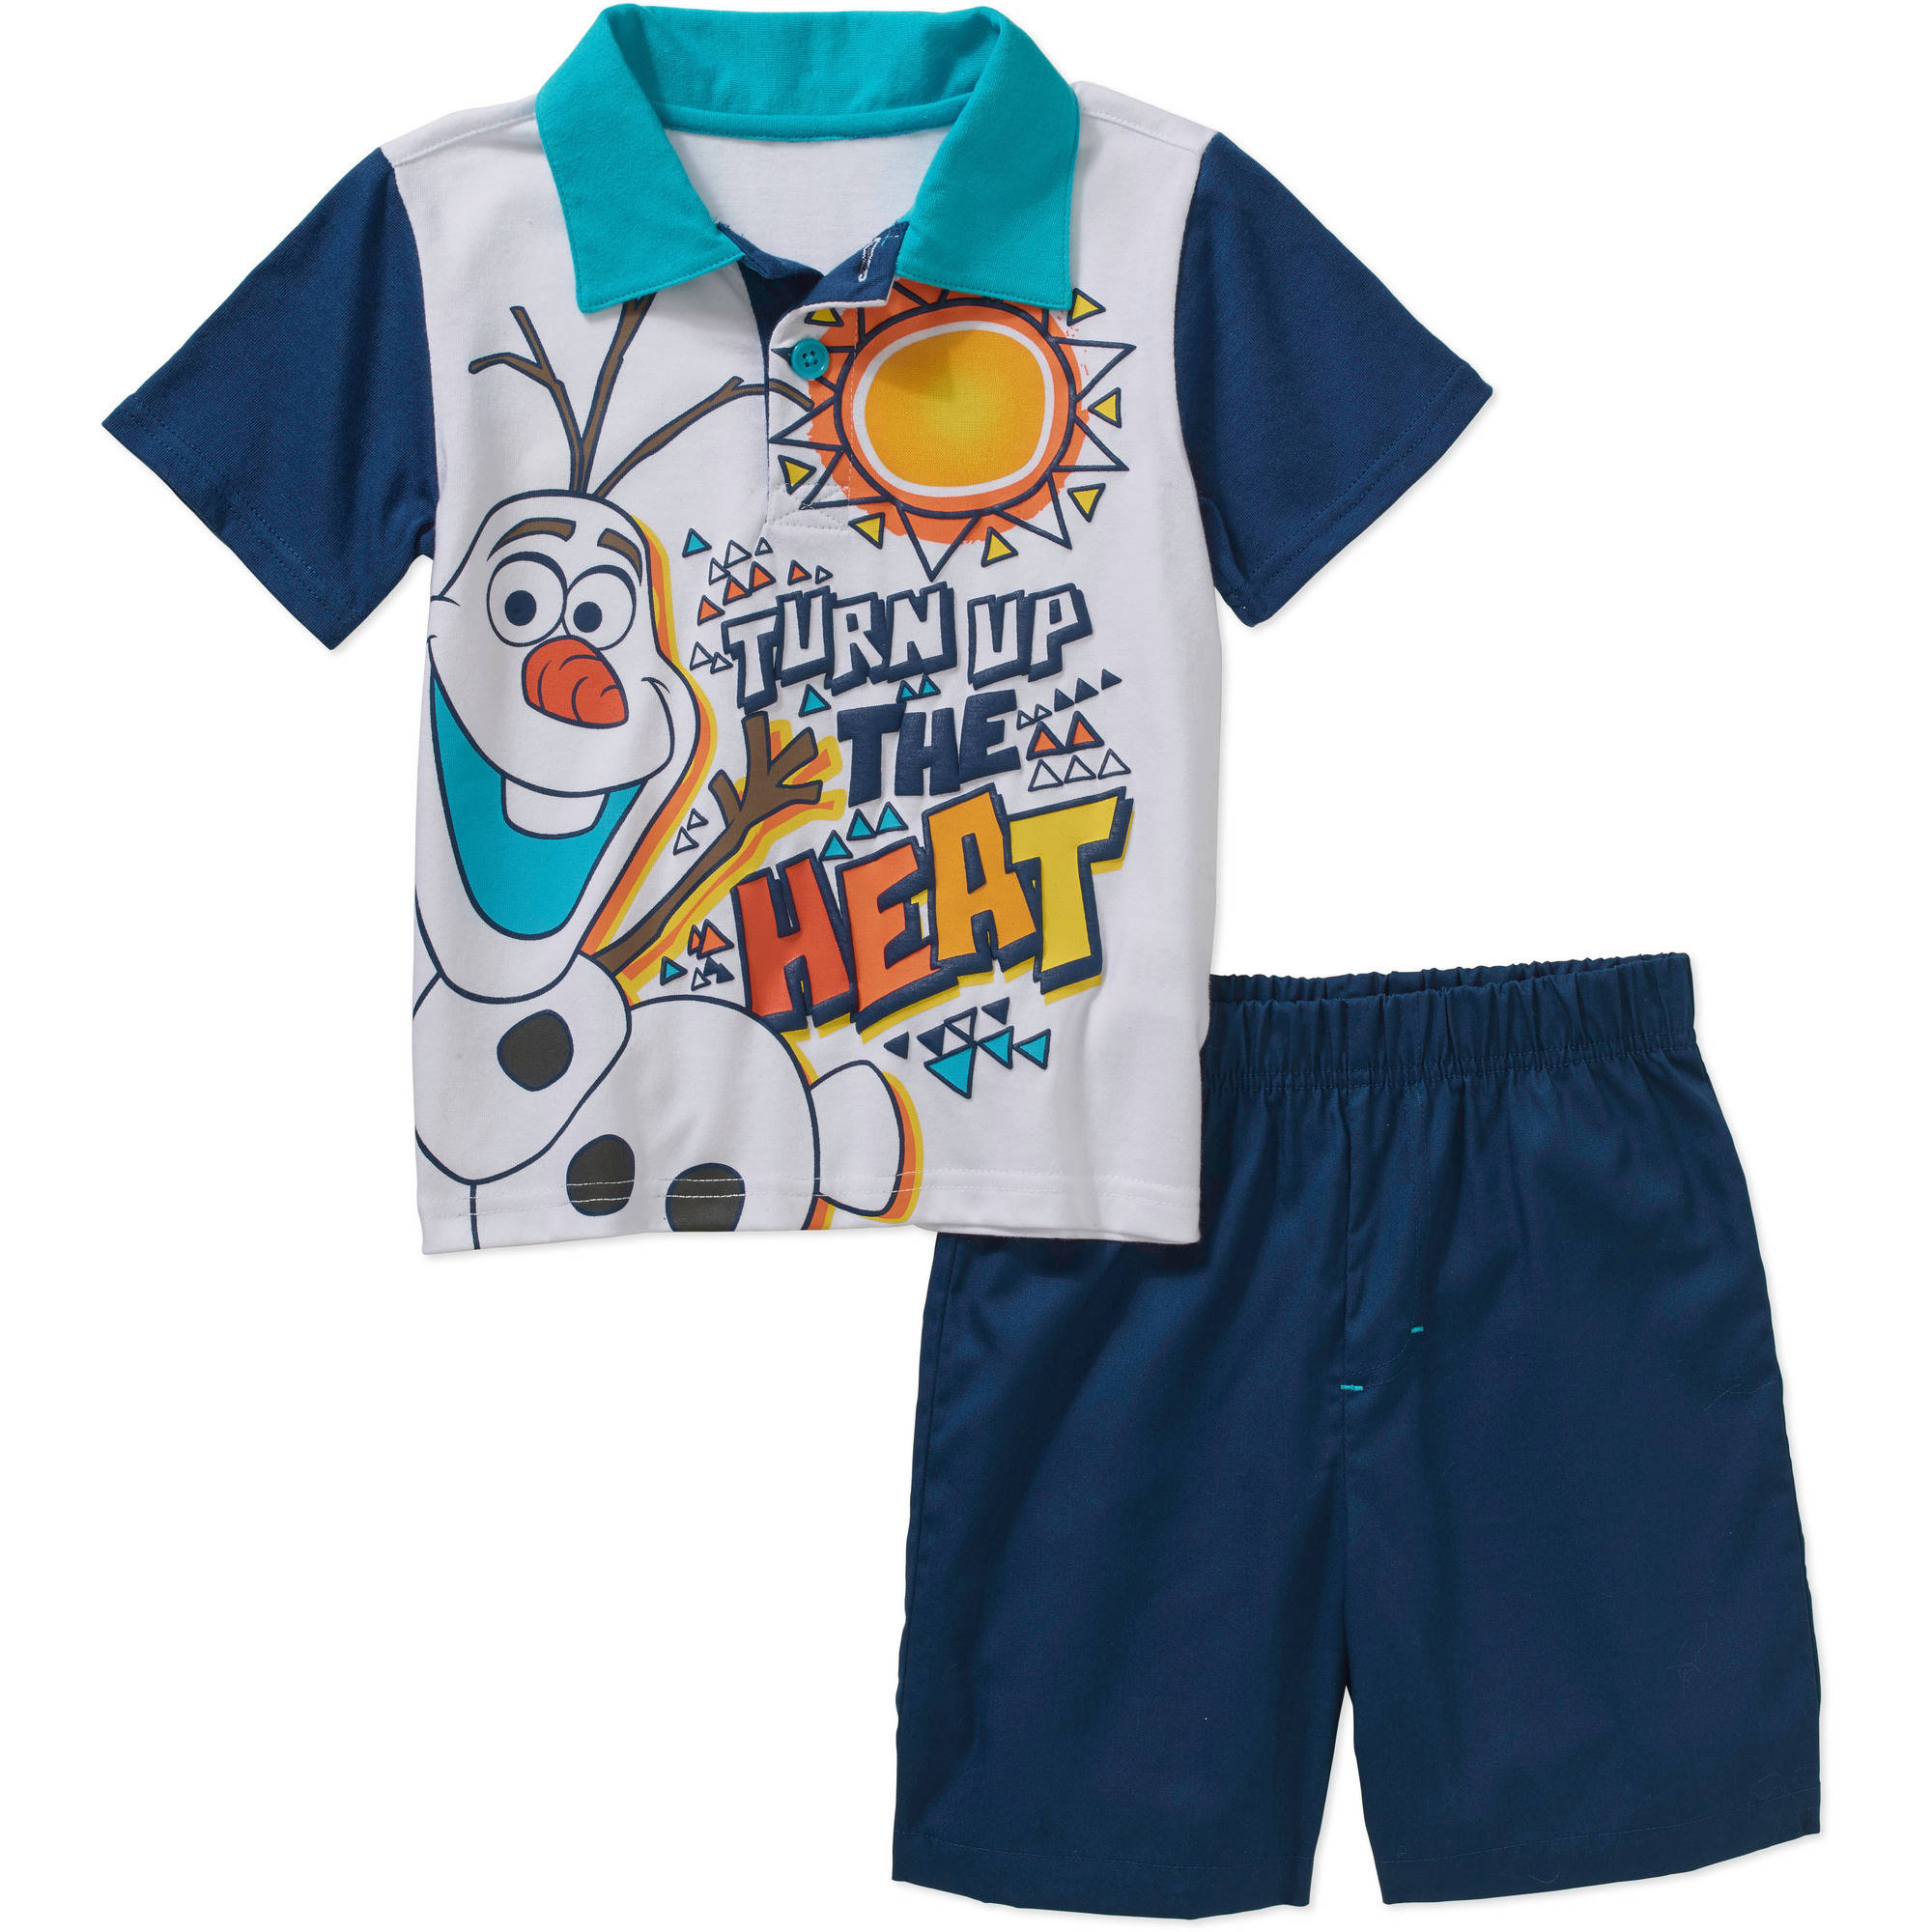 Disney Frozen Olaf the Snowman Toddler Boys Polo Shirt and Shorts